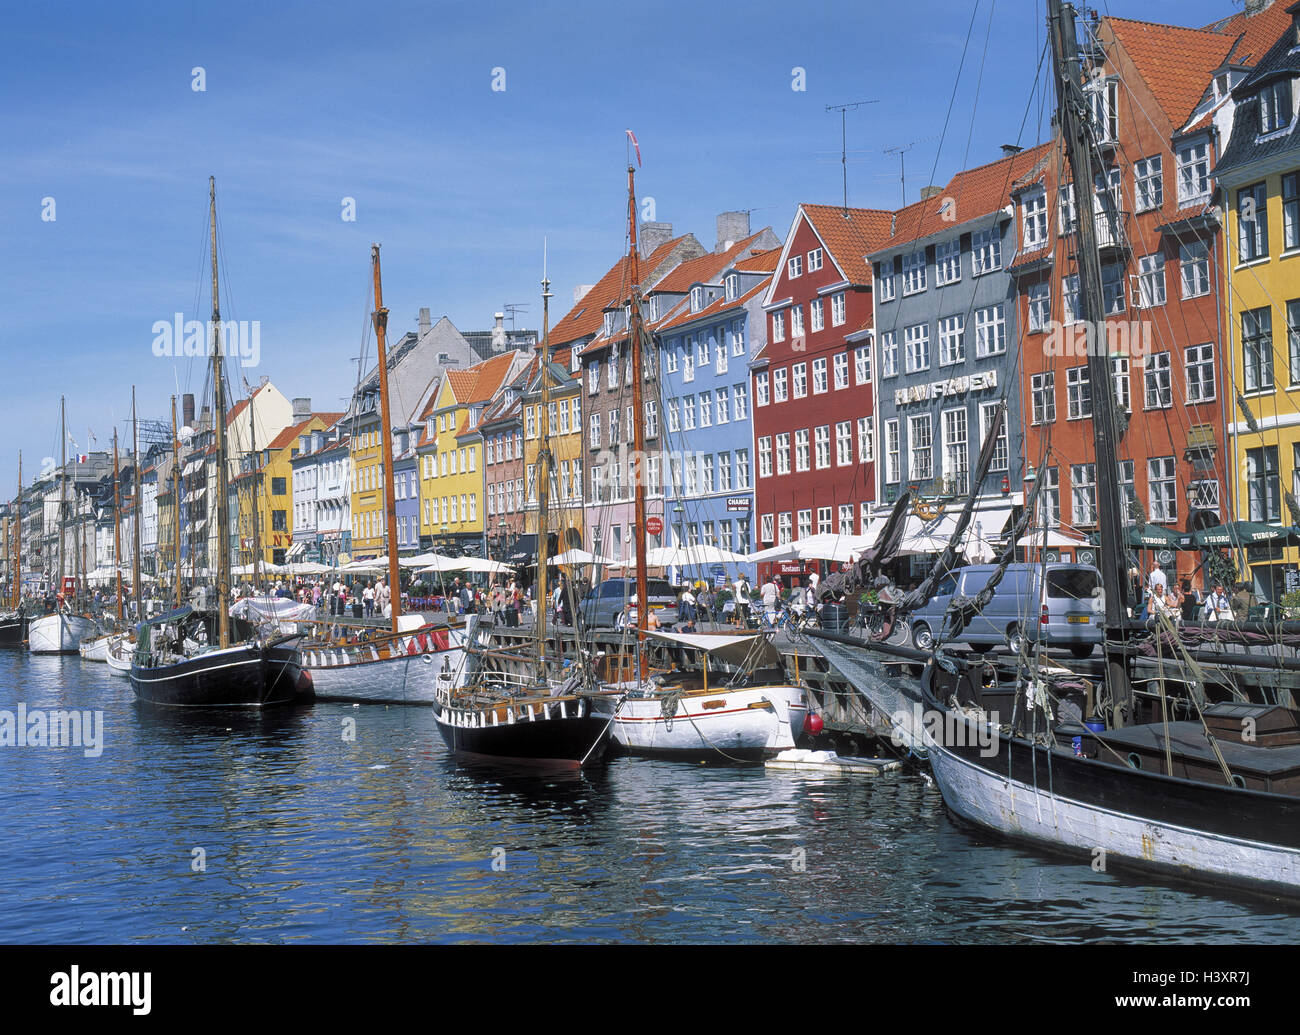 Denmark, Copenhagen, town view, Nyhavn, bite channel, ships, Europe, Scandinavia, capital, Old Town, waterway, channel, - Stock Image